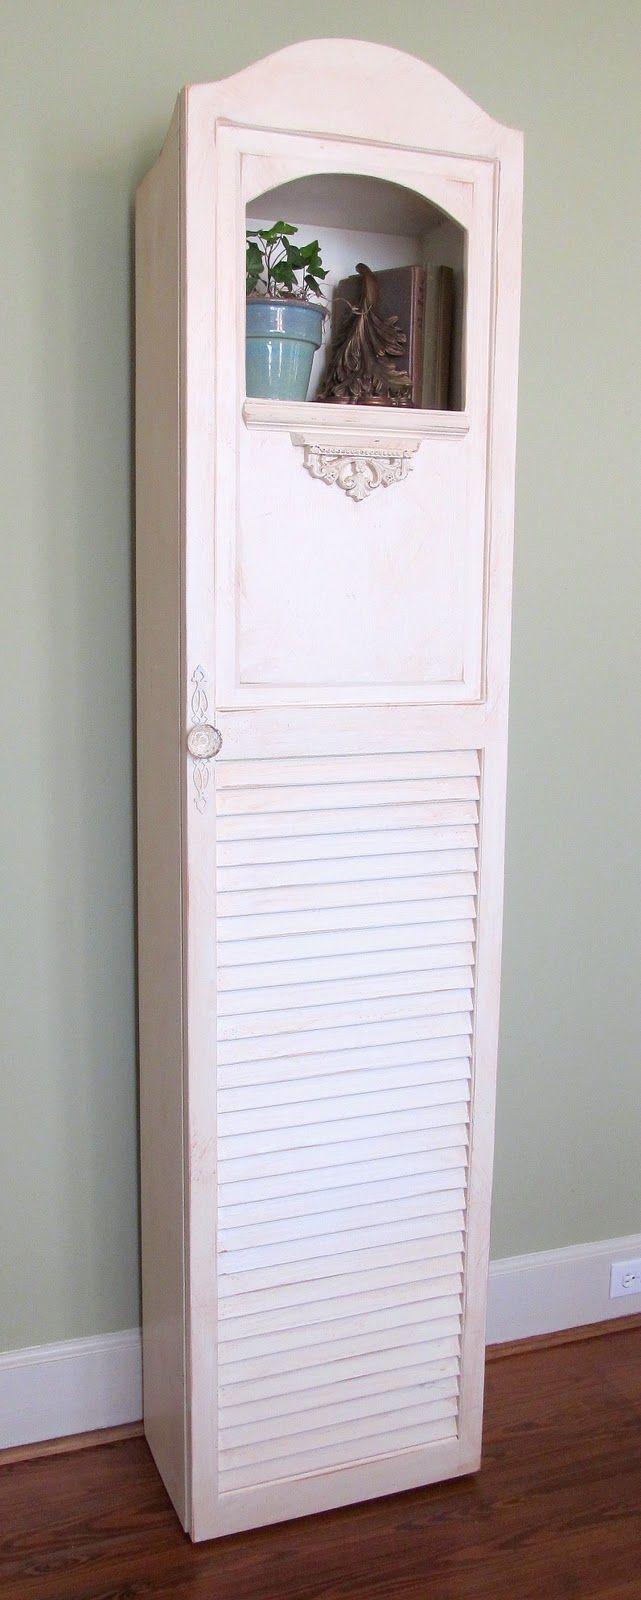 Hallway storage cabinet  Cocina  Diseño  Pinterest  Utility cabinets Shutter doors and